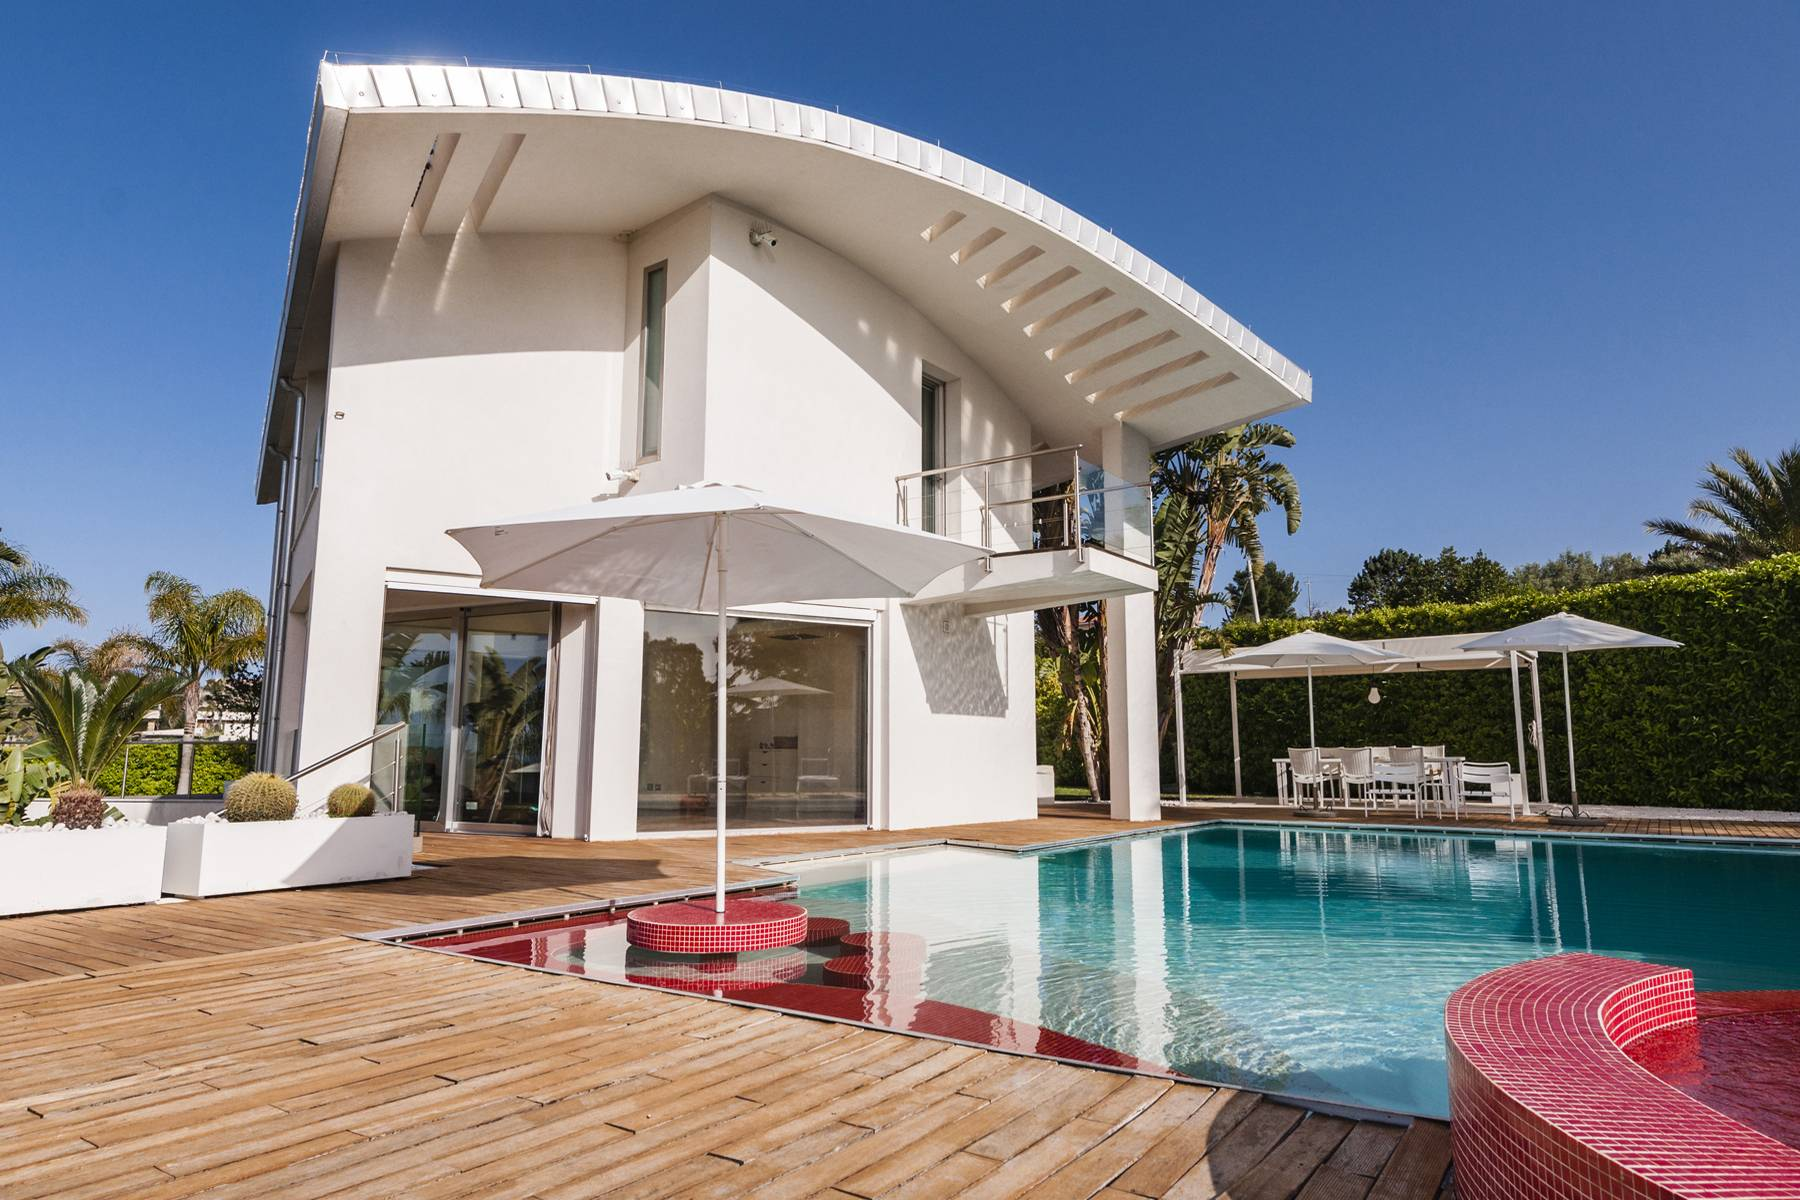 Villa con piscina a Brucoli - 24